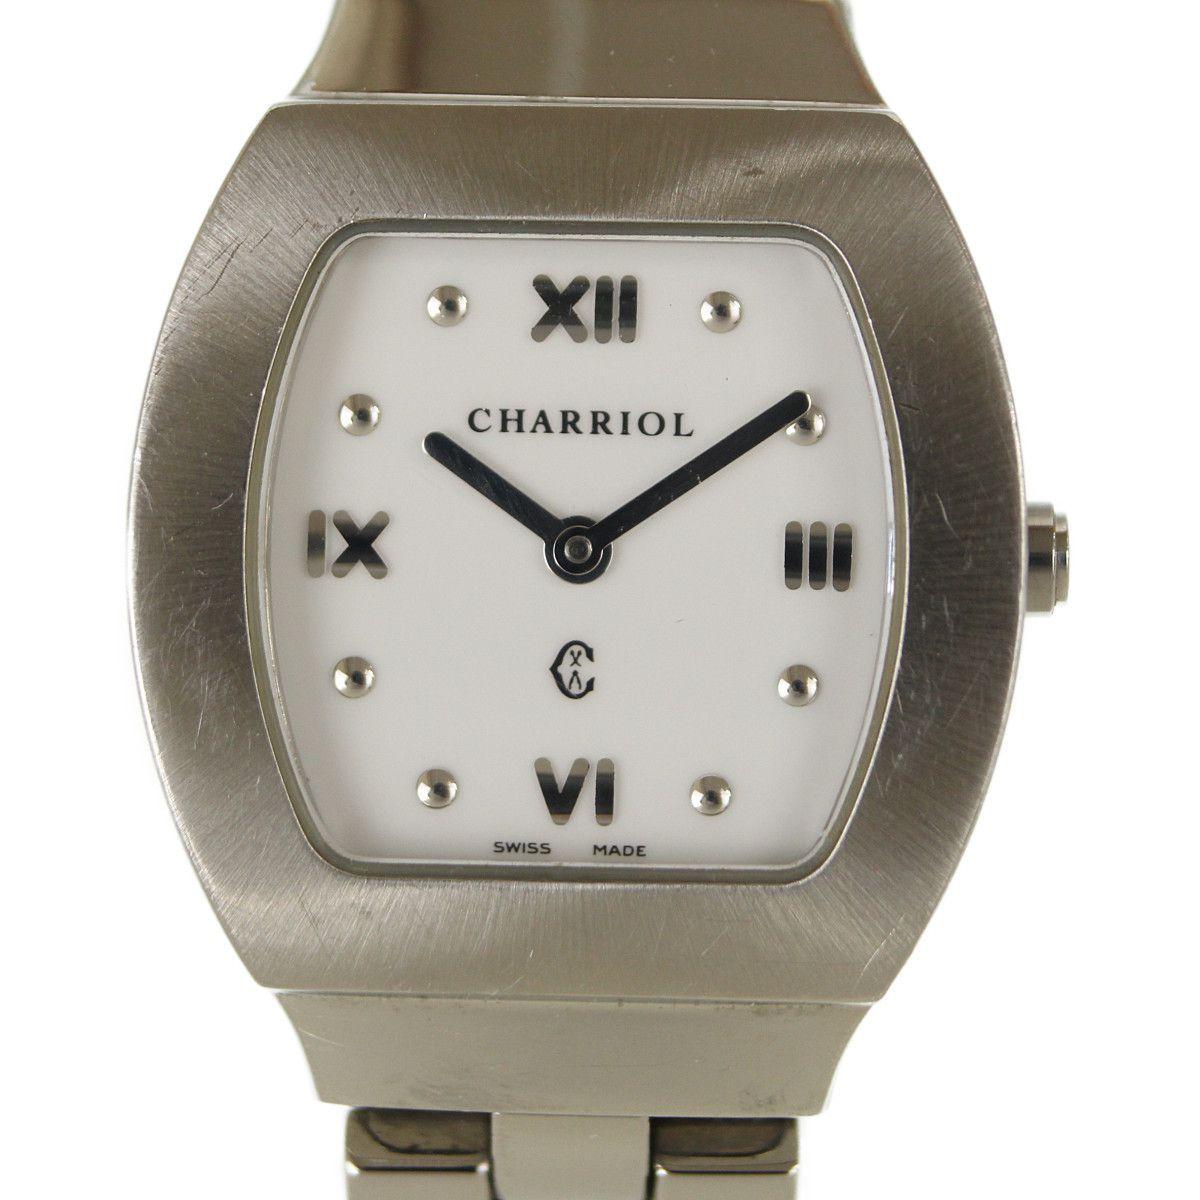 682e7325ccb3 1円~ CHARRIOL シャリオール AZURT アジュール レディース腕時計 クオーツ 女性用【中古】236450